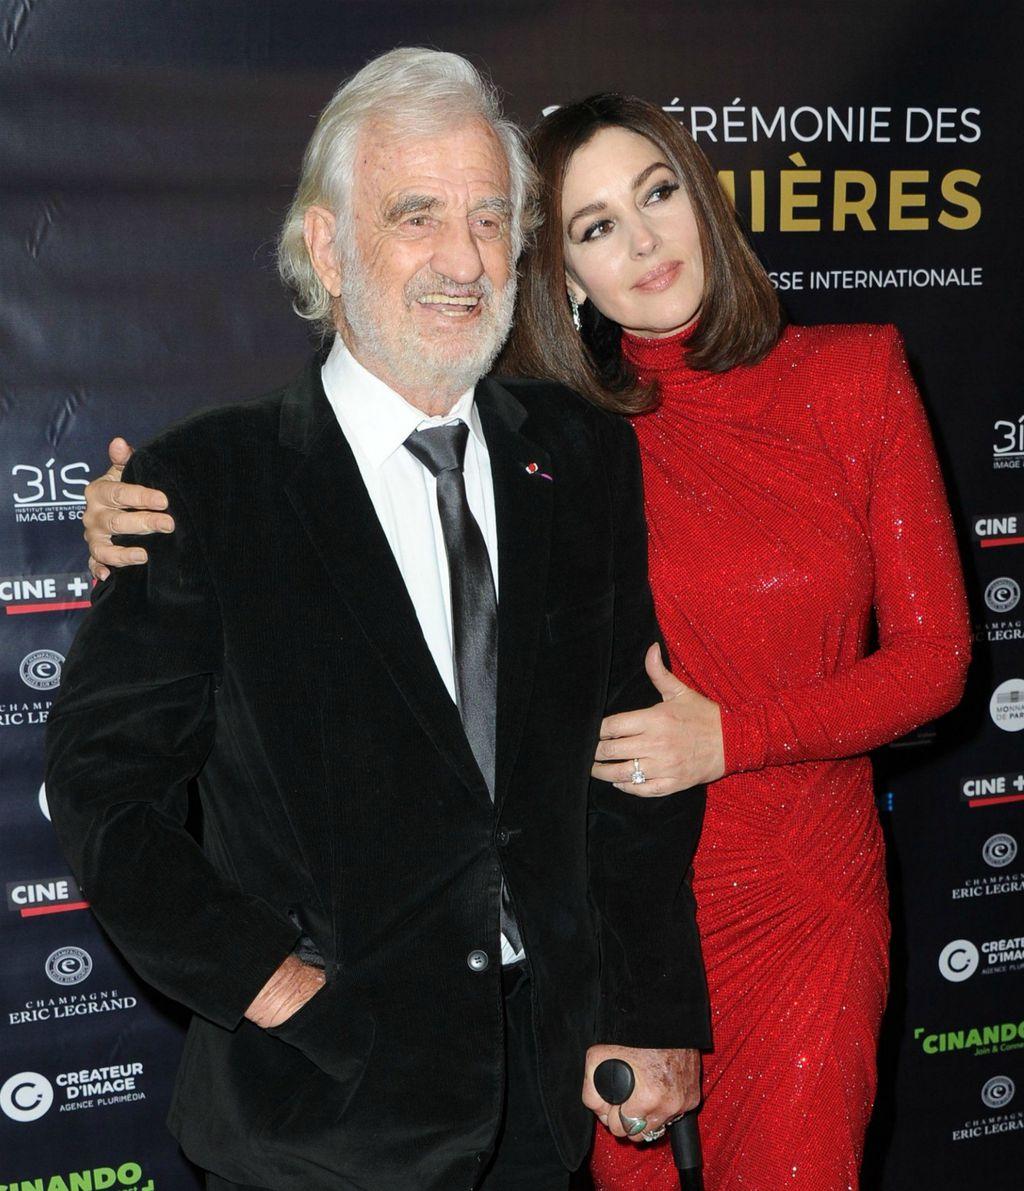 Jean-Paul Belmondo i Monica Bellucci na dodjeli nagrada Lumiere